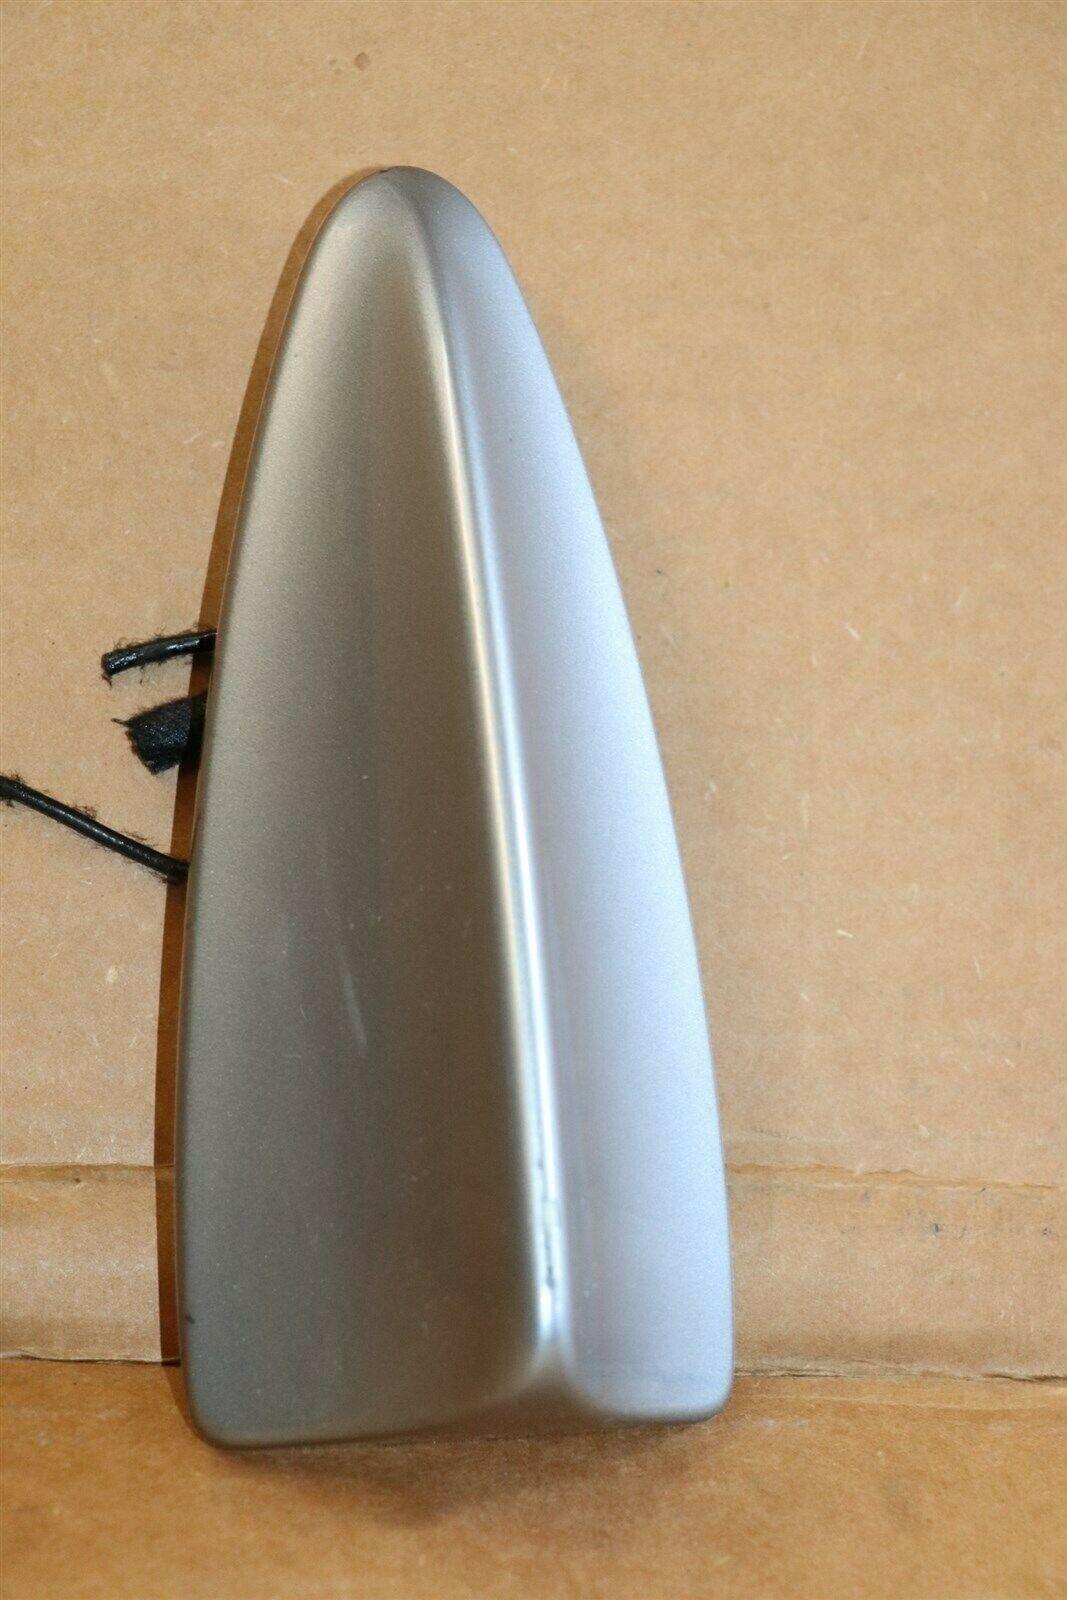 04-06 BMW X3 Roof Mounted Shark Fin Antenna GPS